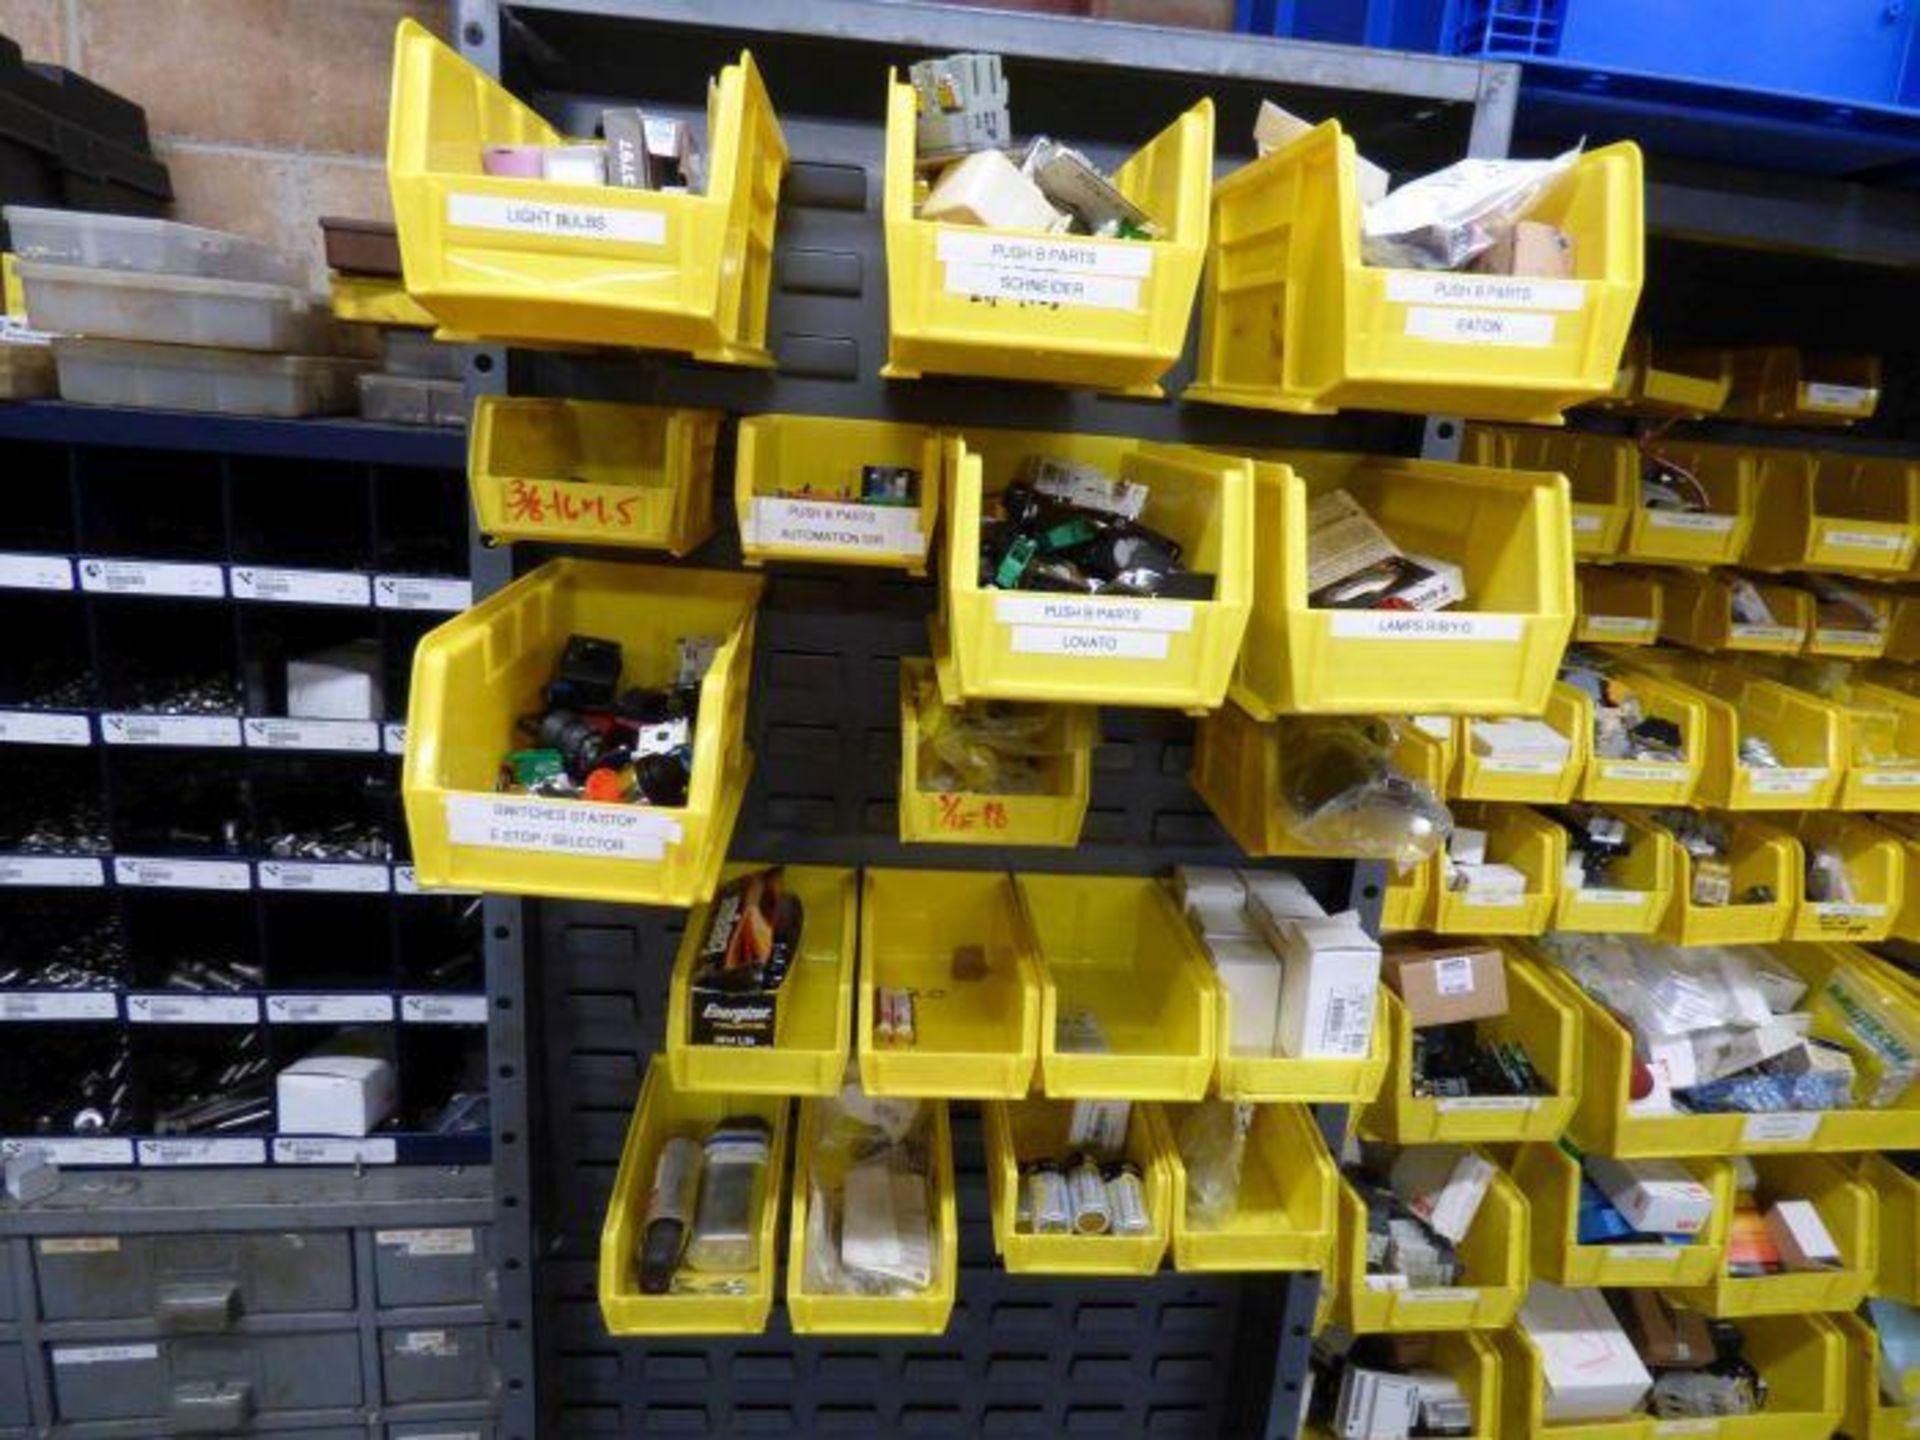 Lot 1153 - Contents of Mechanic Room